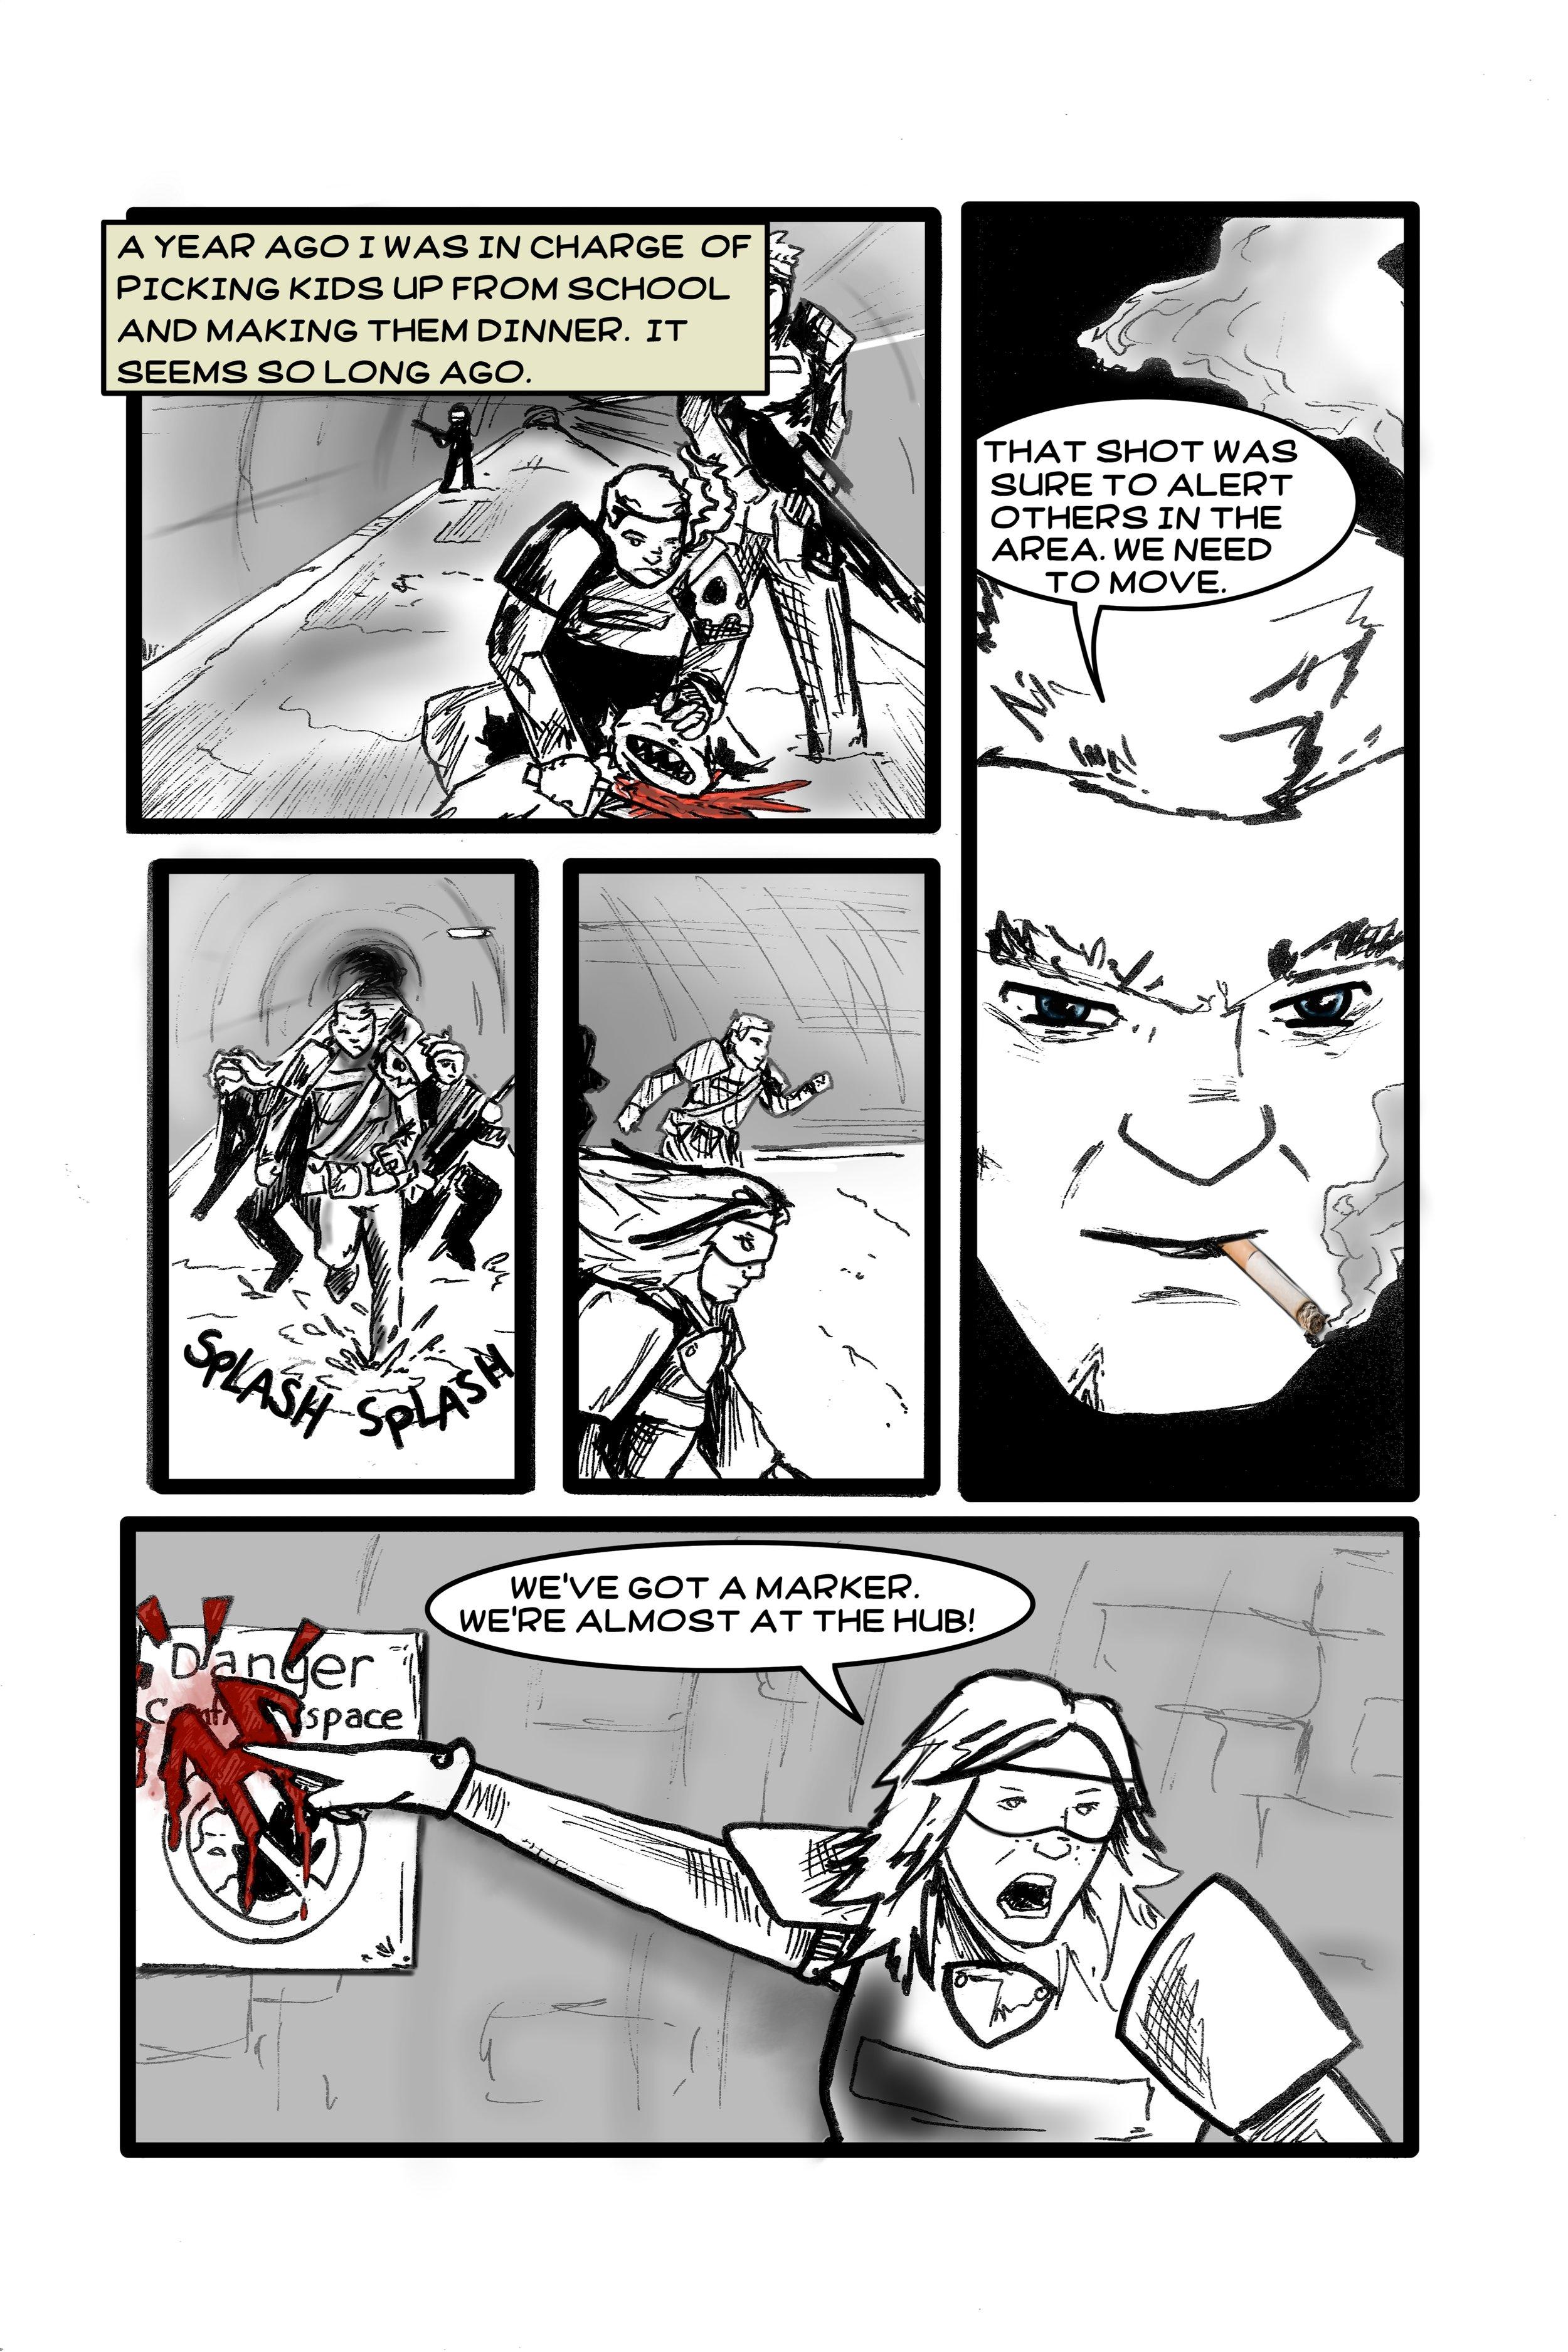 twh page7.jpg